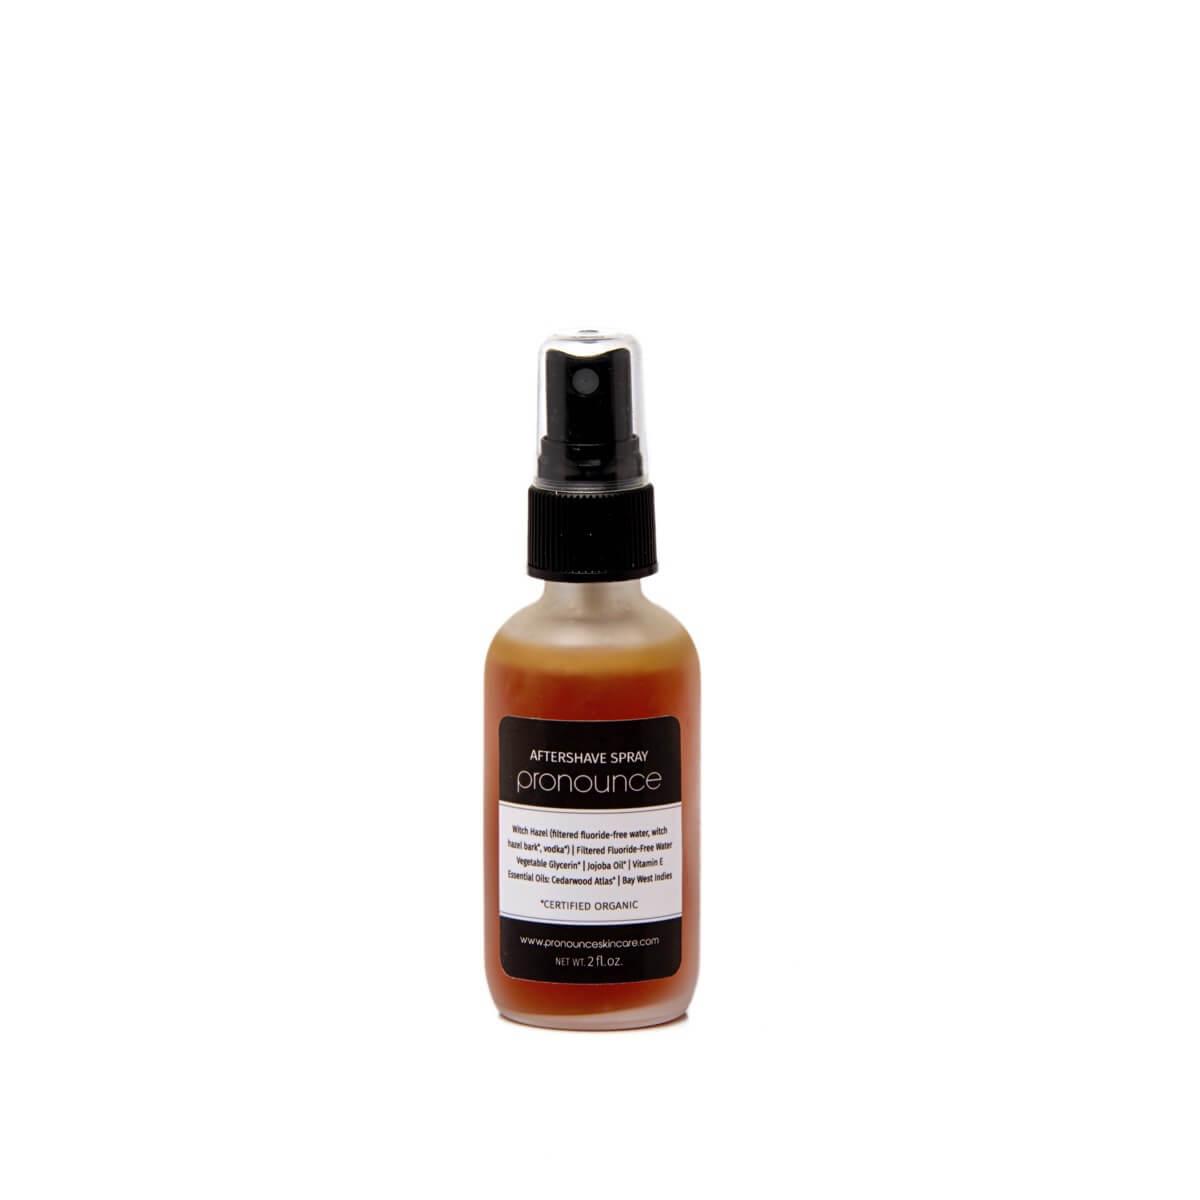 Aftershave Spray 2oz- Pronounce Skincare 1200 x 1200